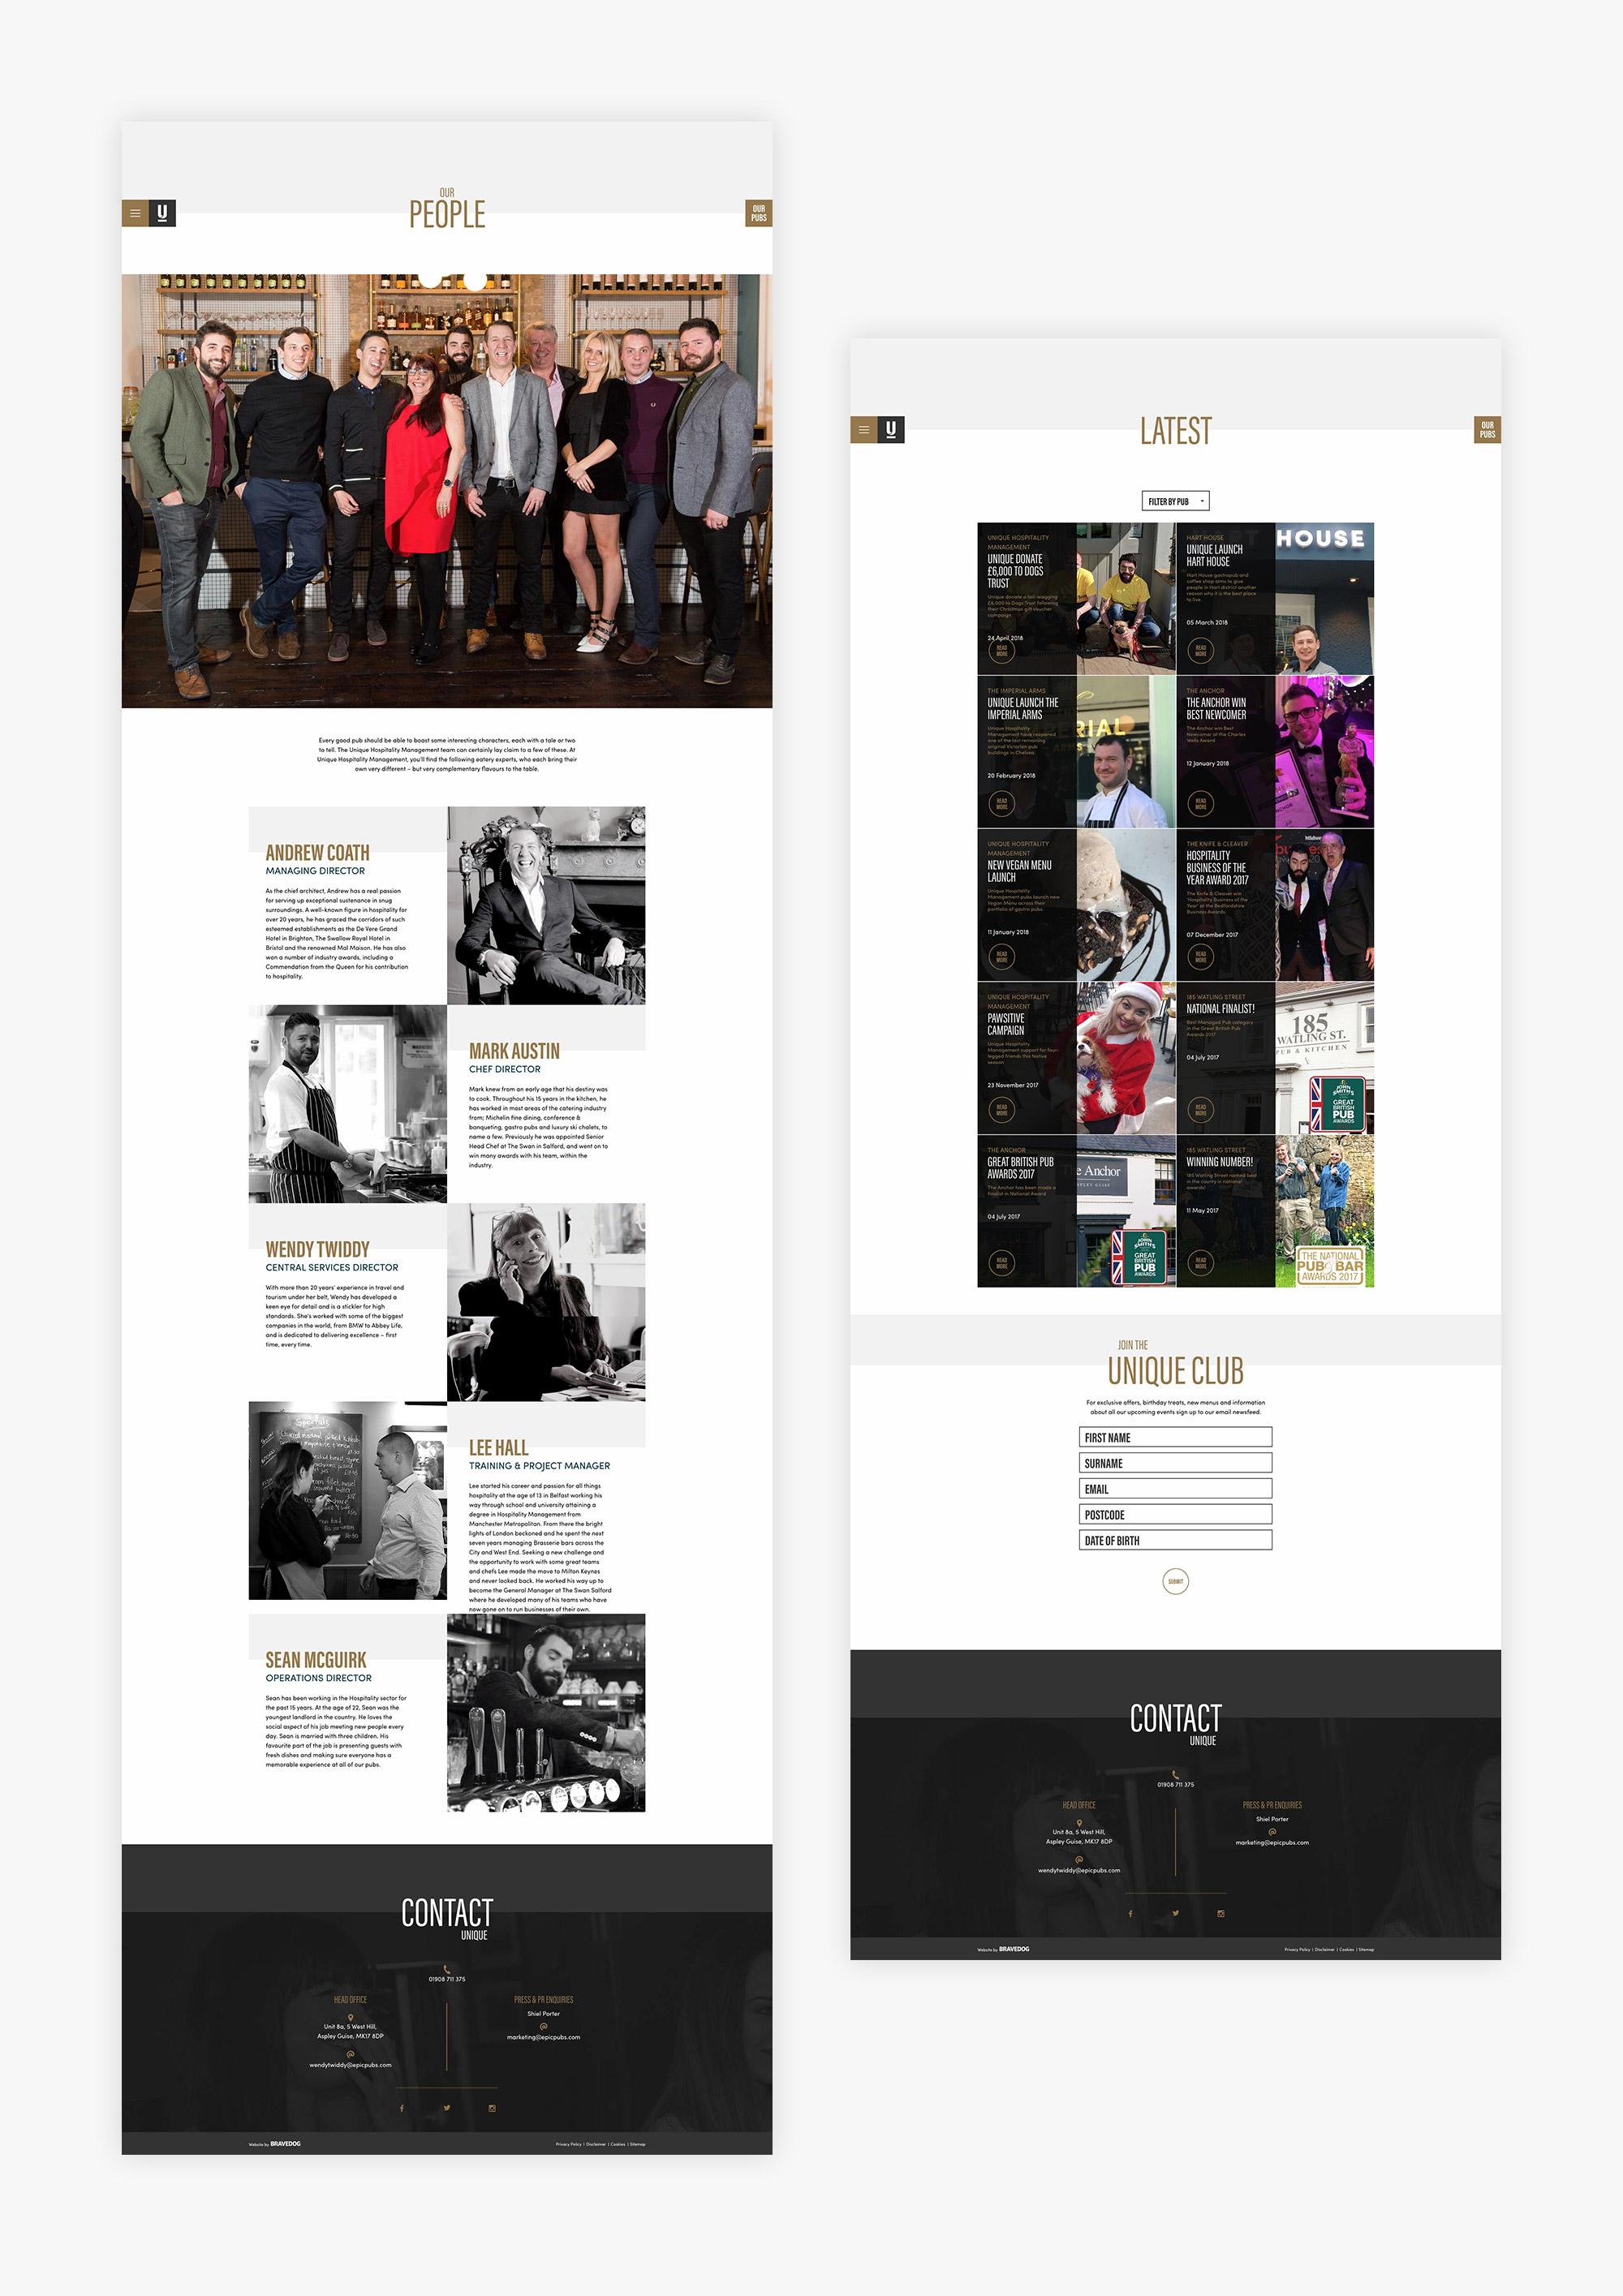 website design for Unique Hospitality Management and pub group